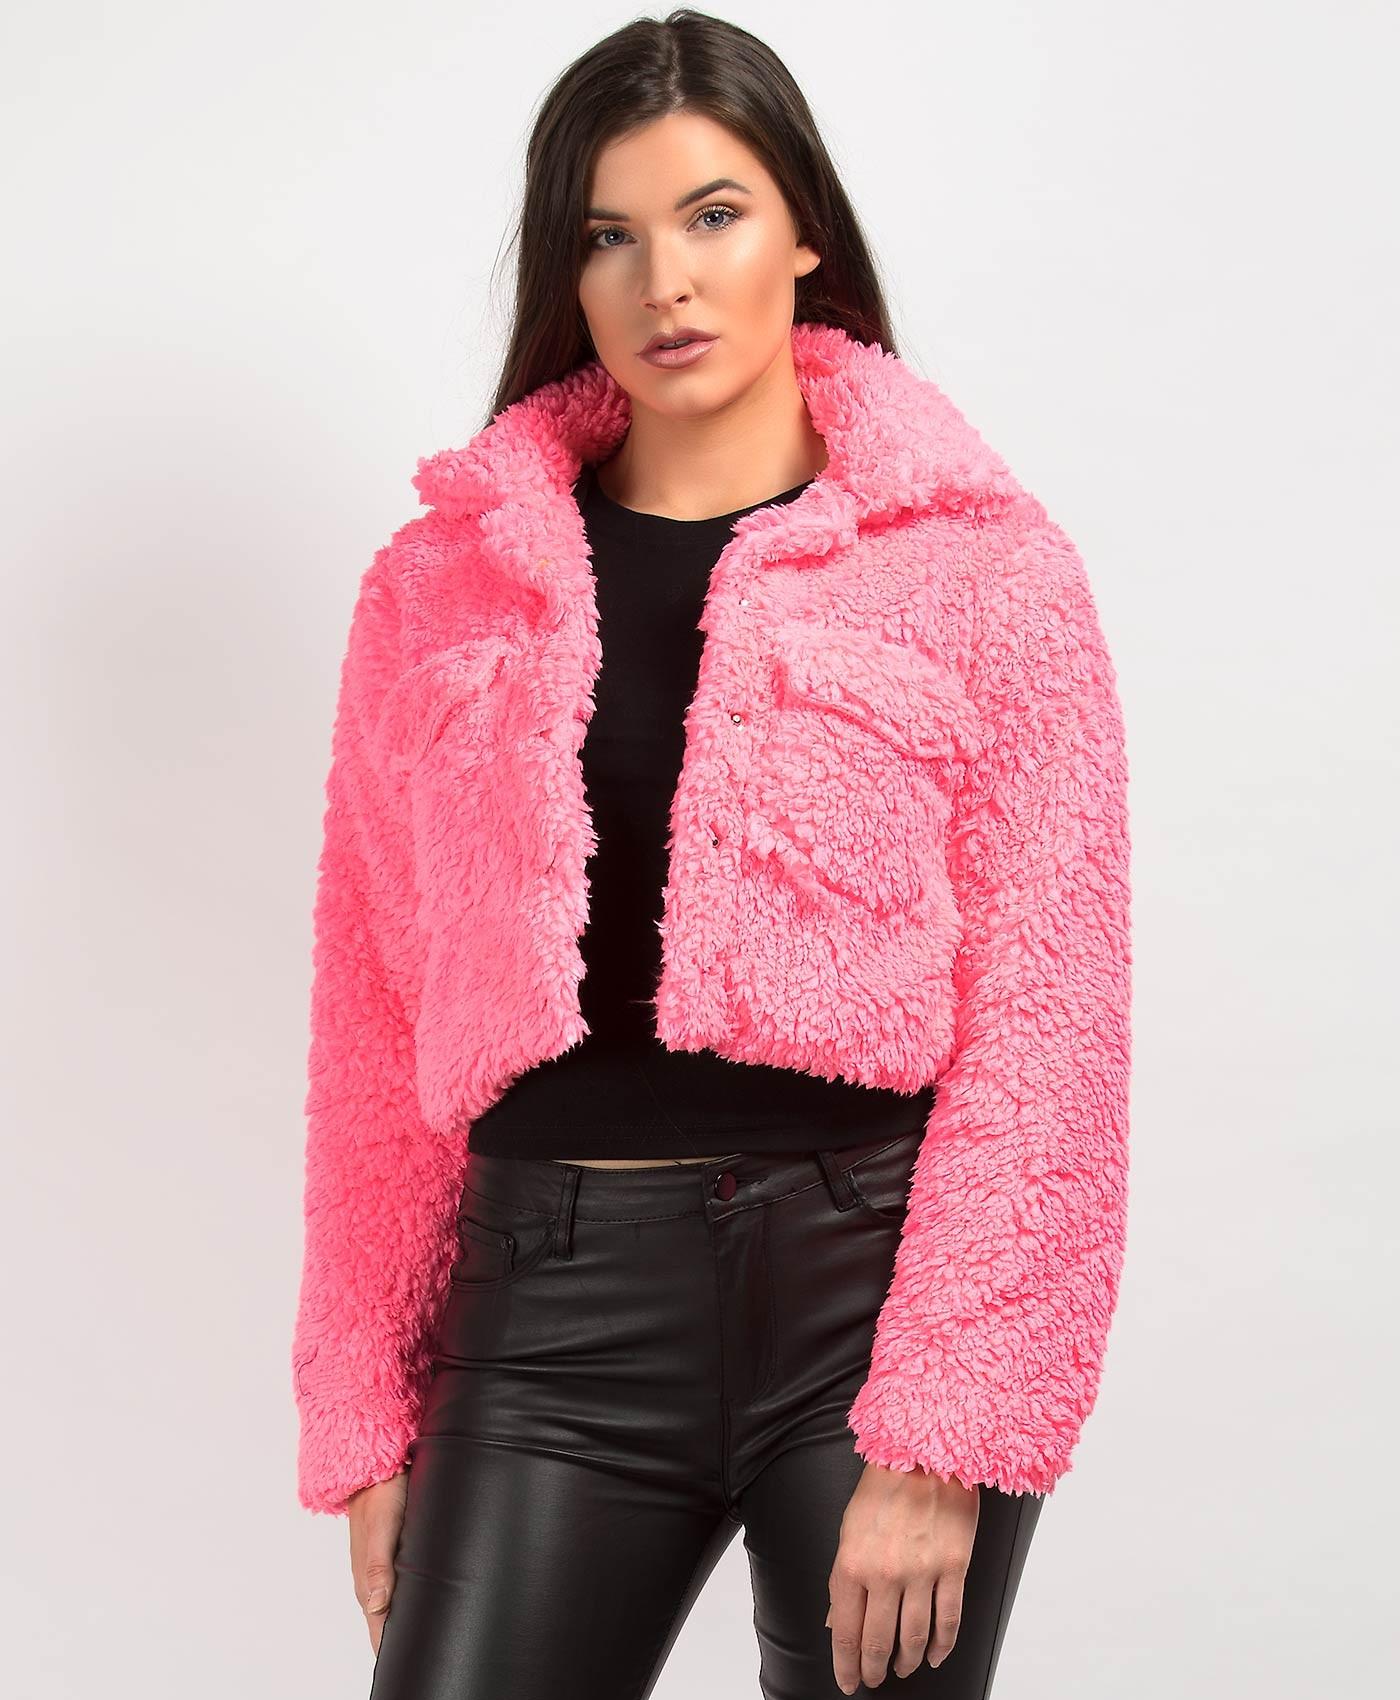 Neon Pink Teddy Fur Cropped Borg Trucker Jacket